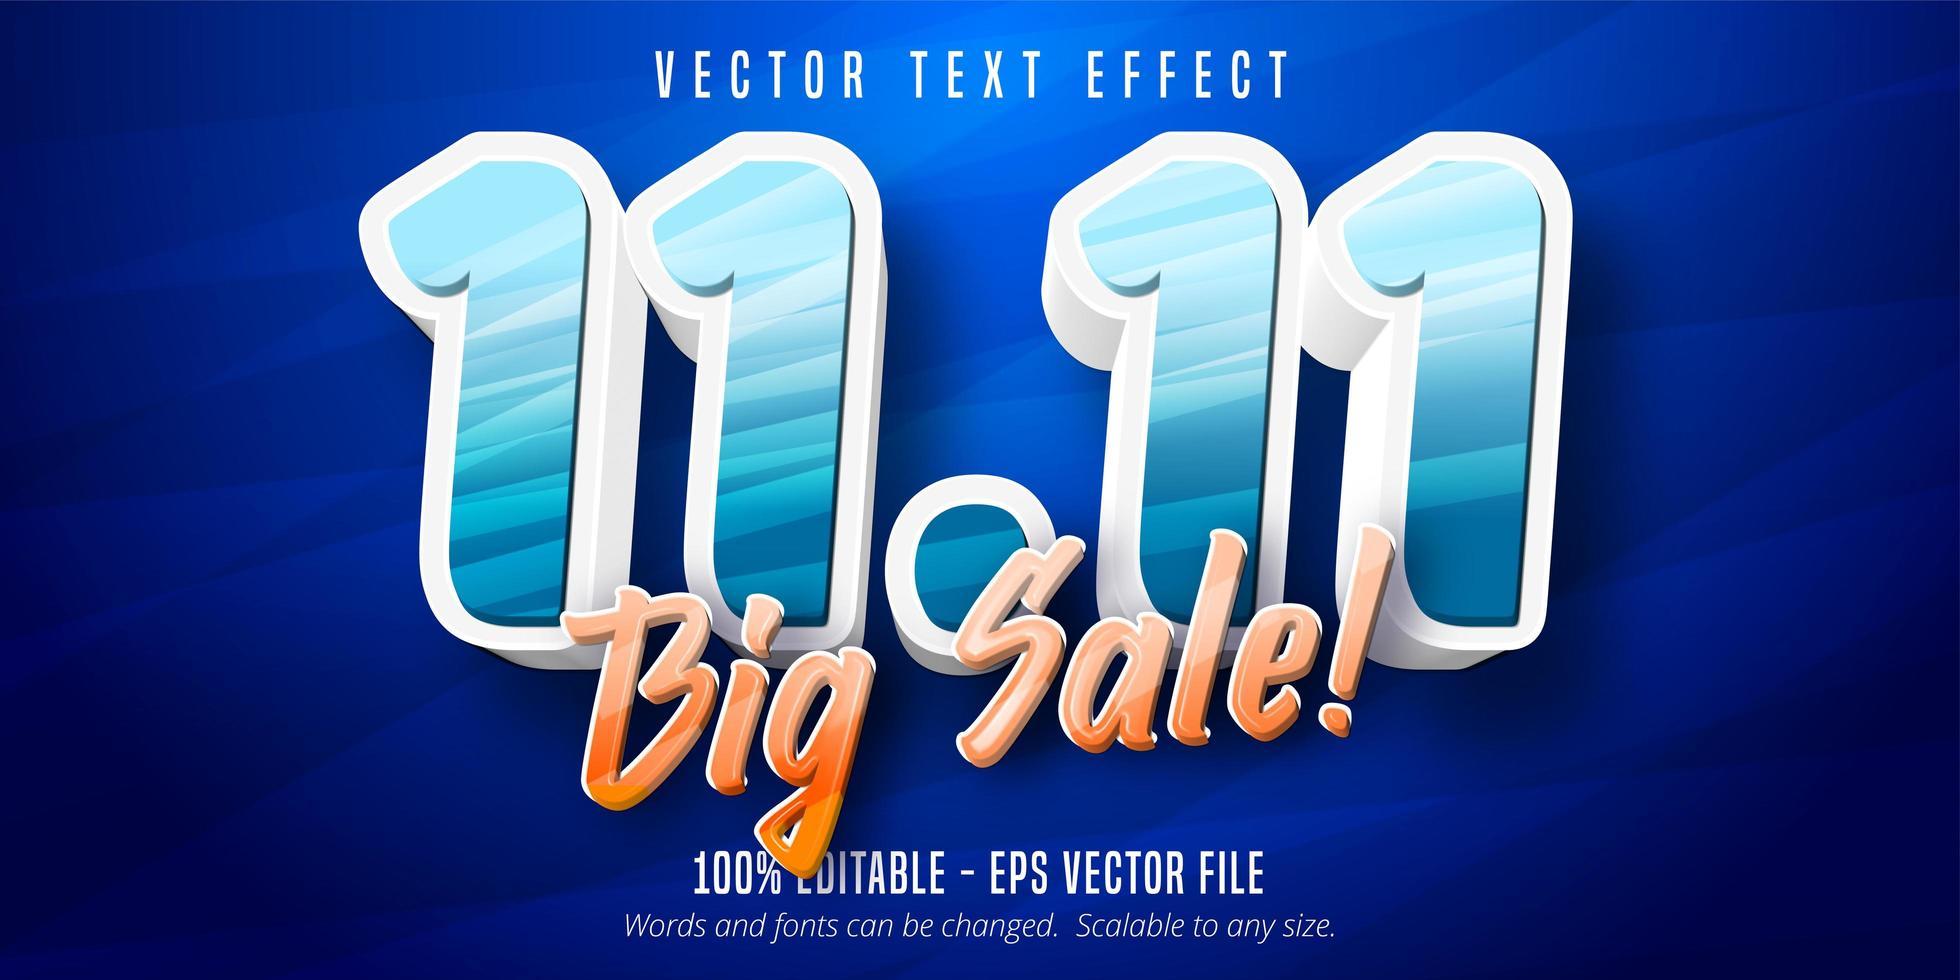 11.11 efeito de texto editável de texto de grande venda vetor